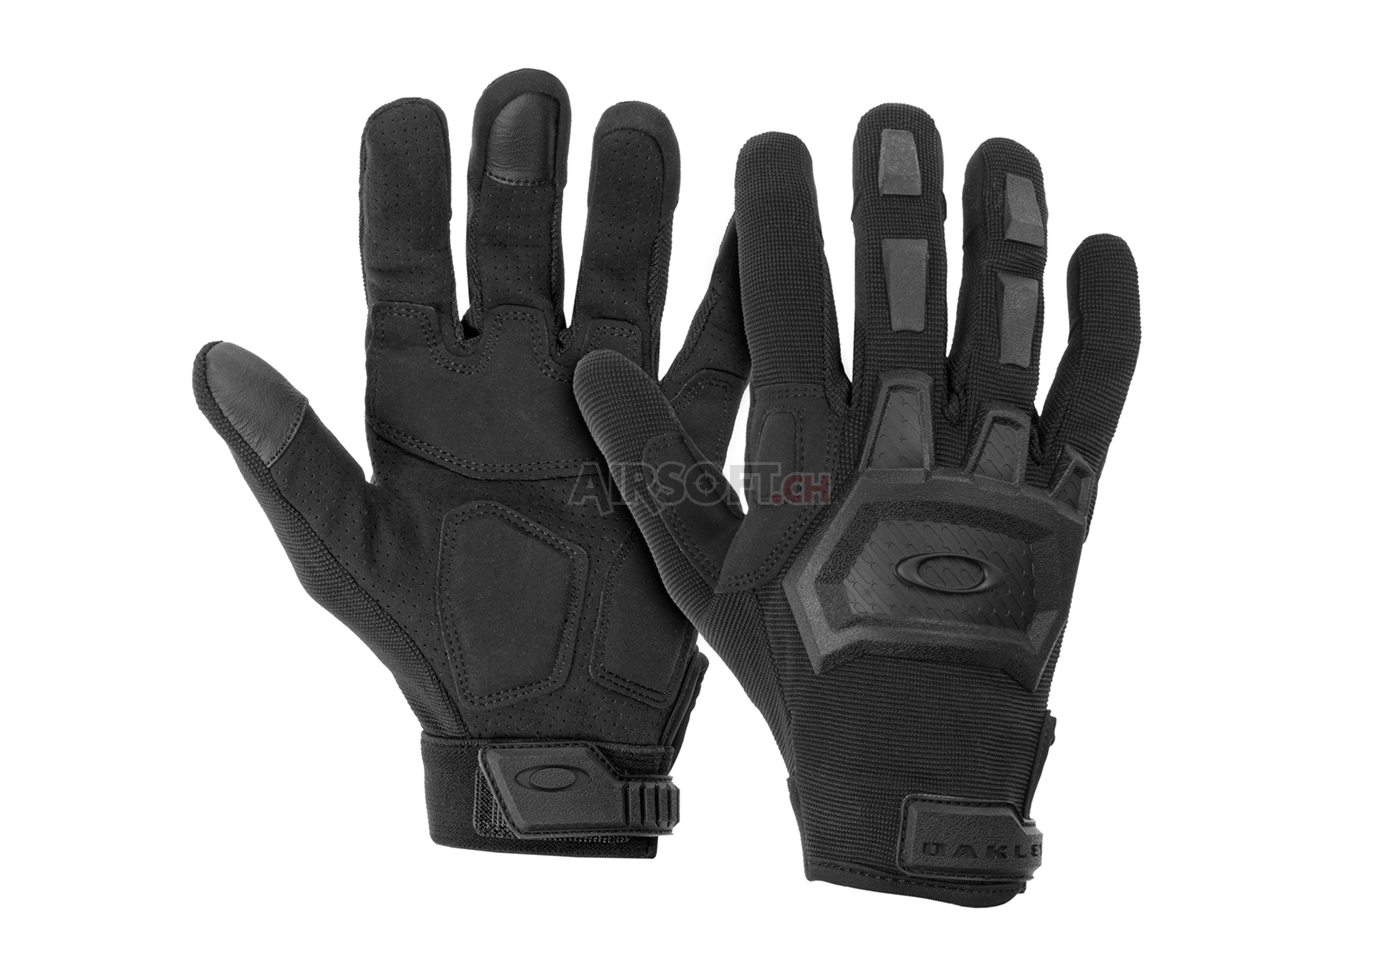 b7504068b19 SI Flexion Gloves Black (Oakley) M - Einsatzhandschuhe - Handschuhe ...